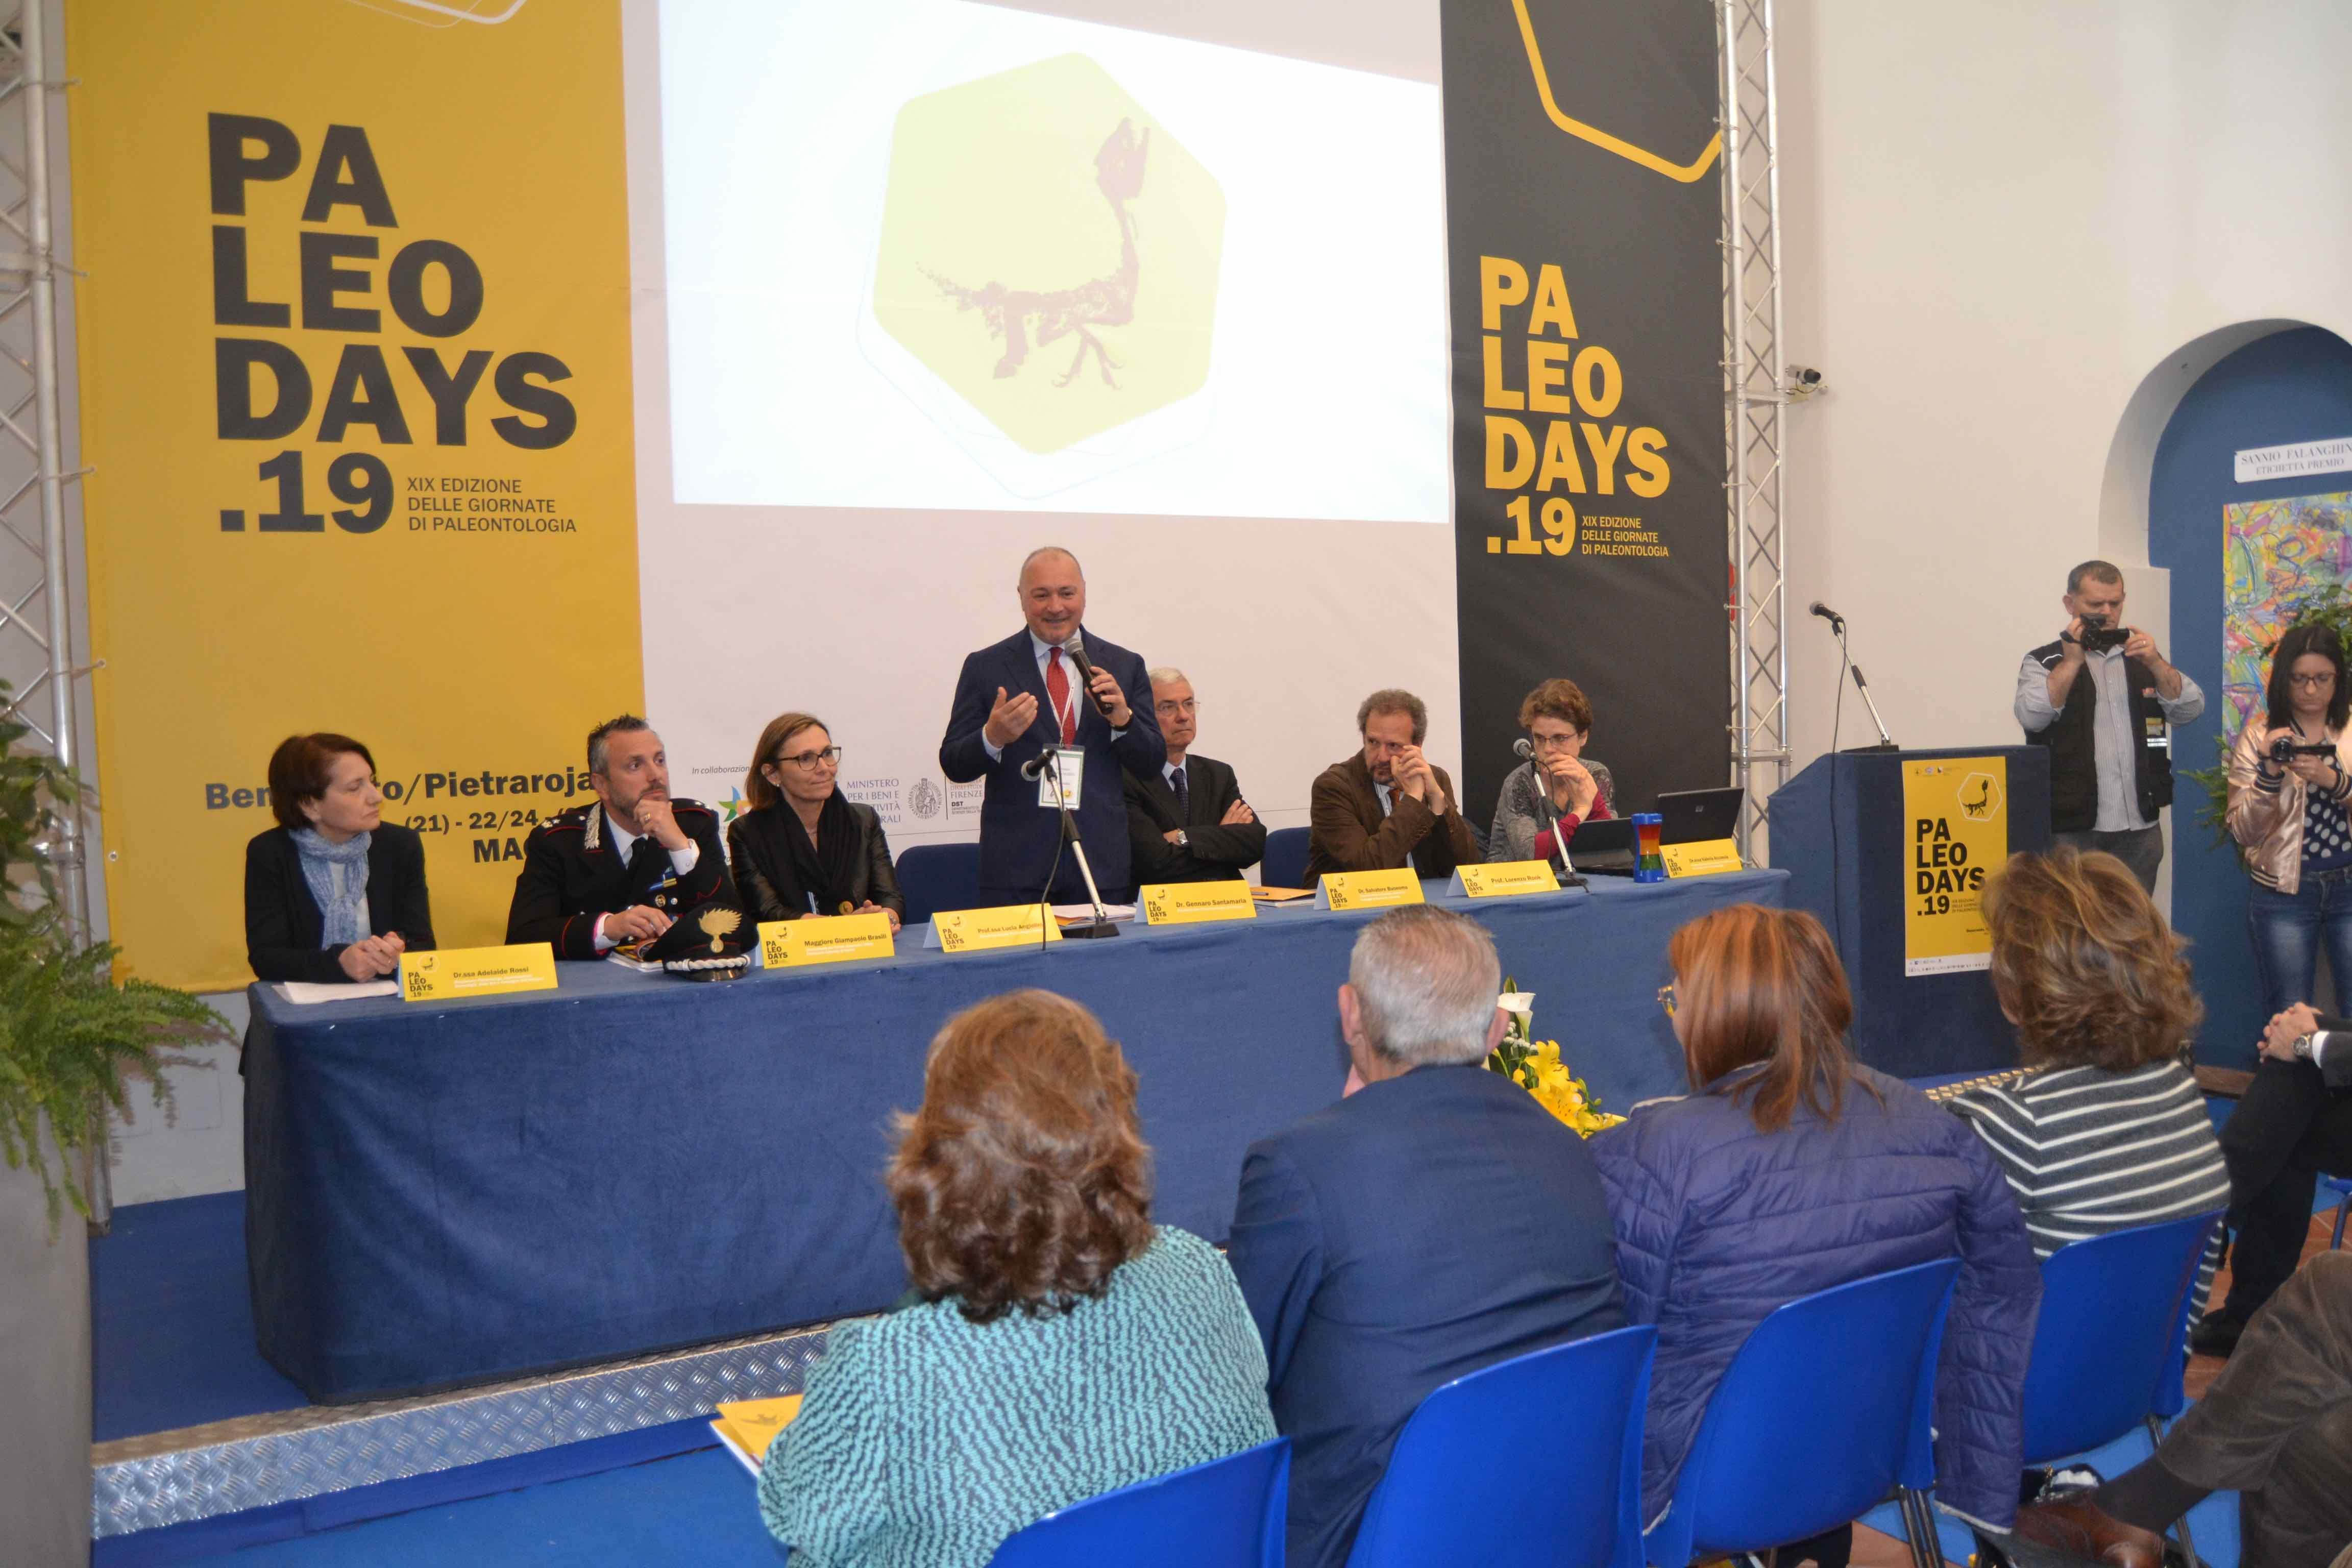 Benevento| Bilancio positivo per Paleodays 2019